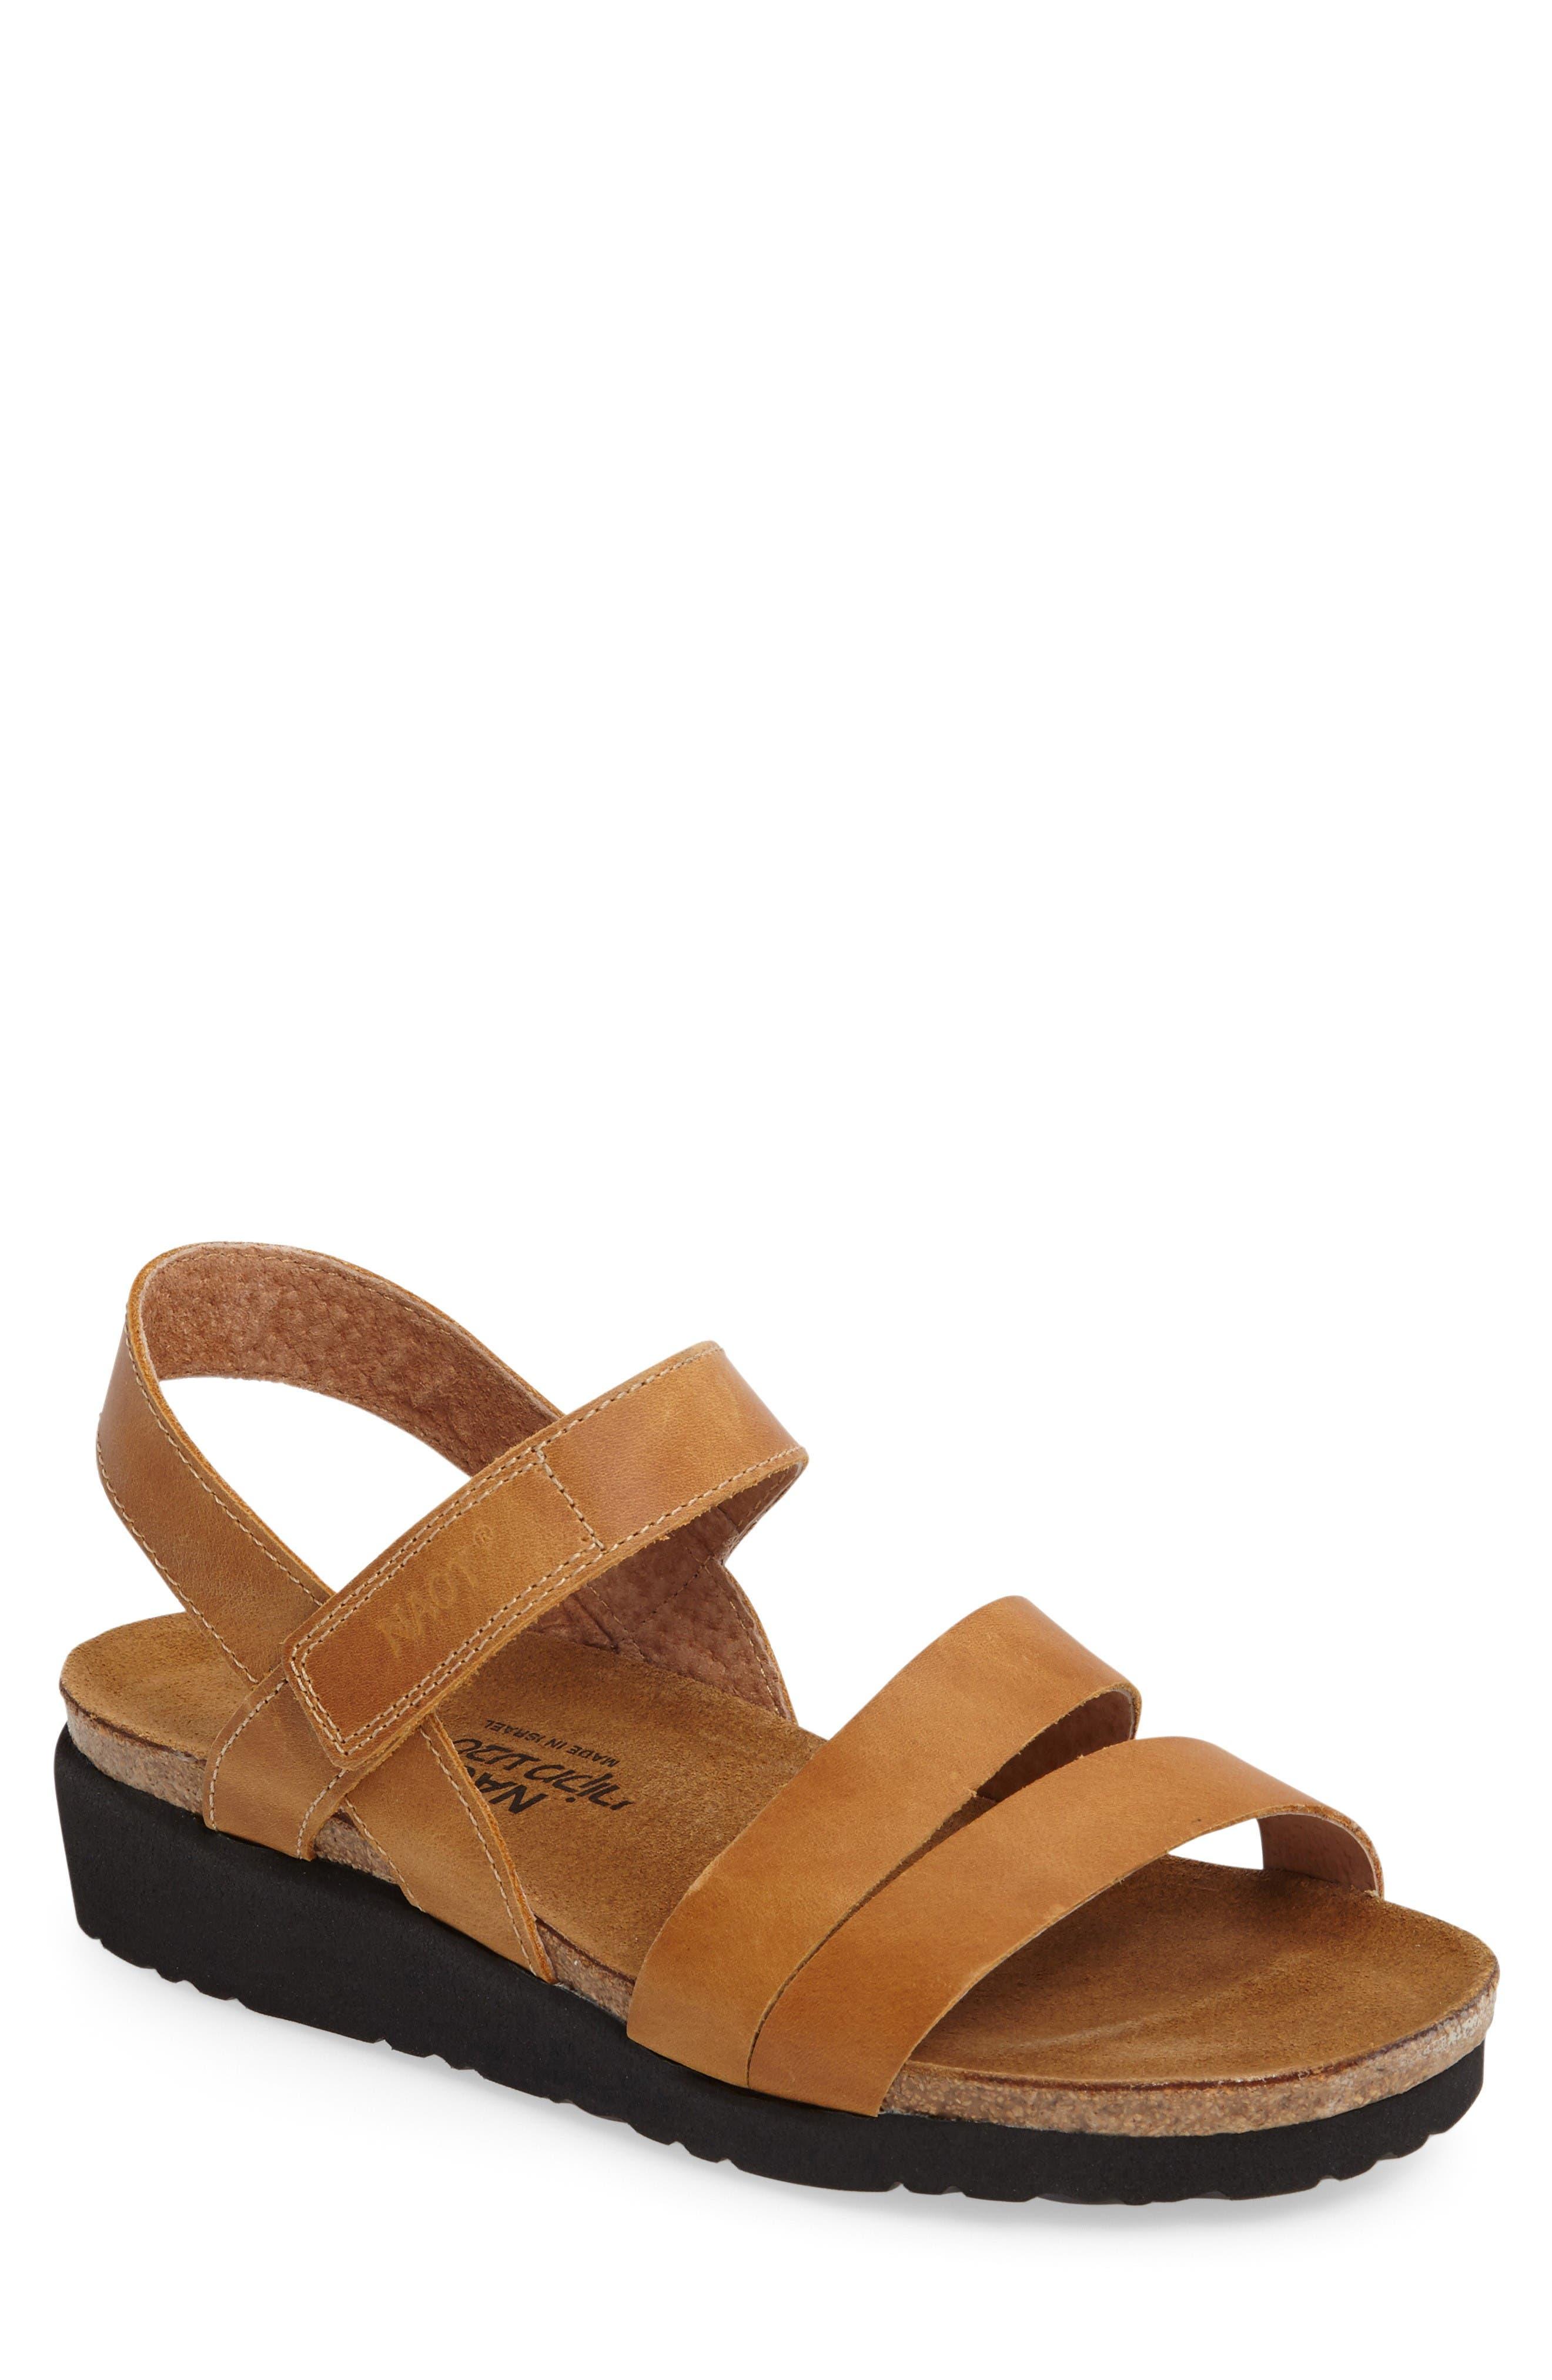 NAOT 'Kayla' Sandal